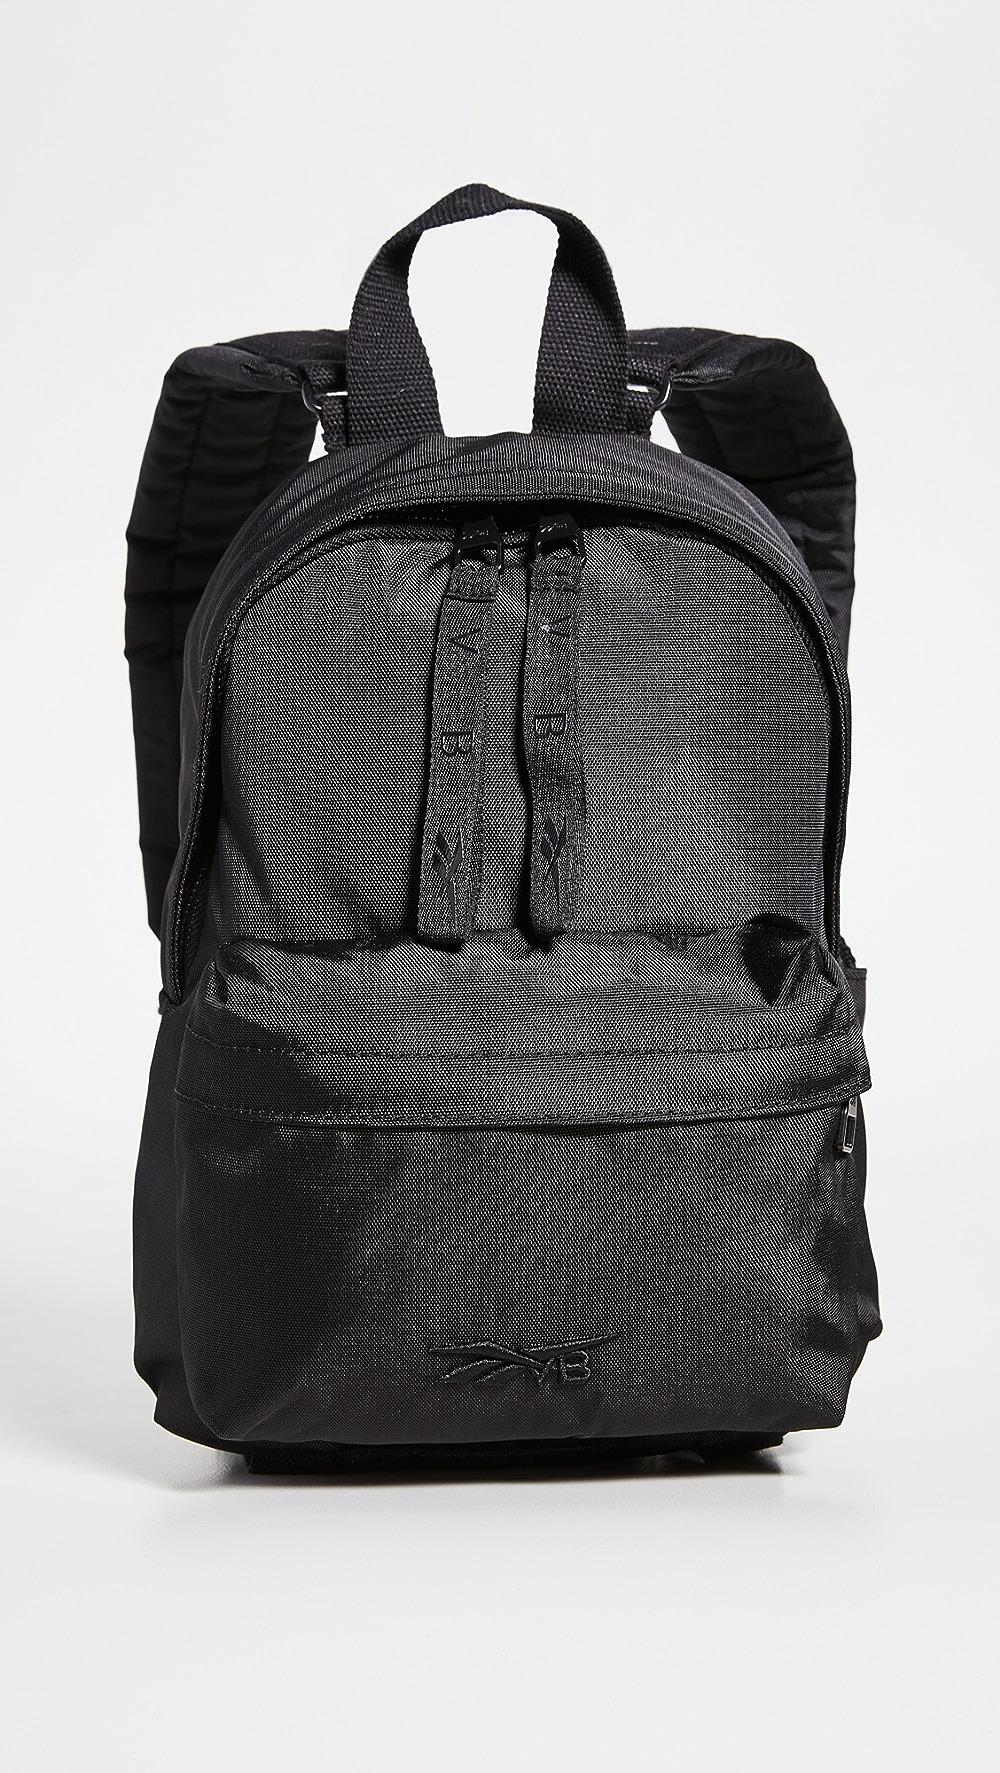 Flight Tracker Reebok X Victoria Beckham - Rbk Vb Mini Backpack High Quality And Inexpensive